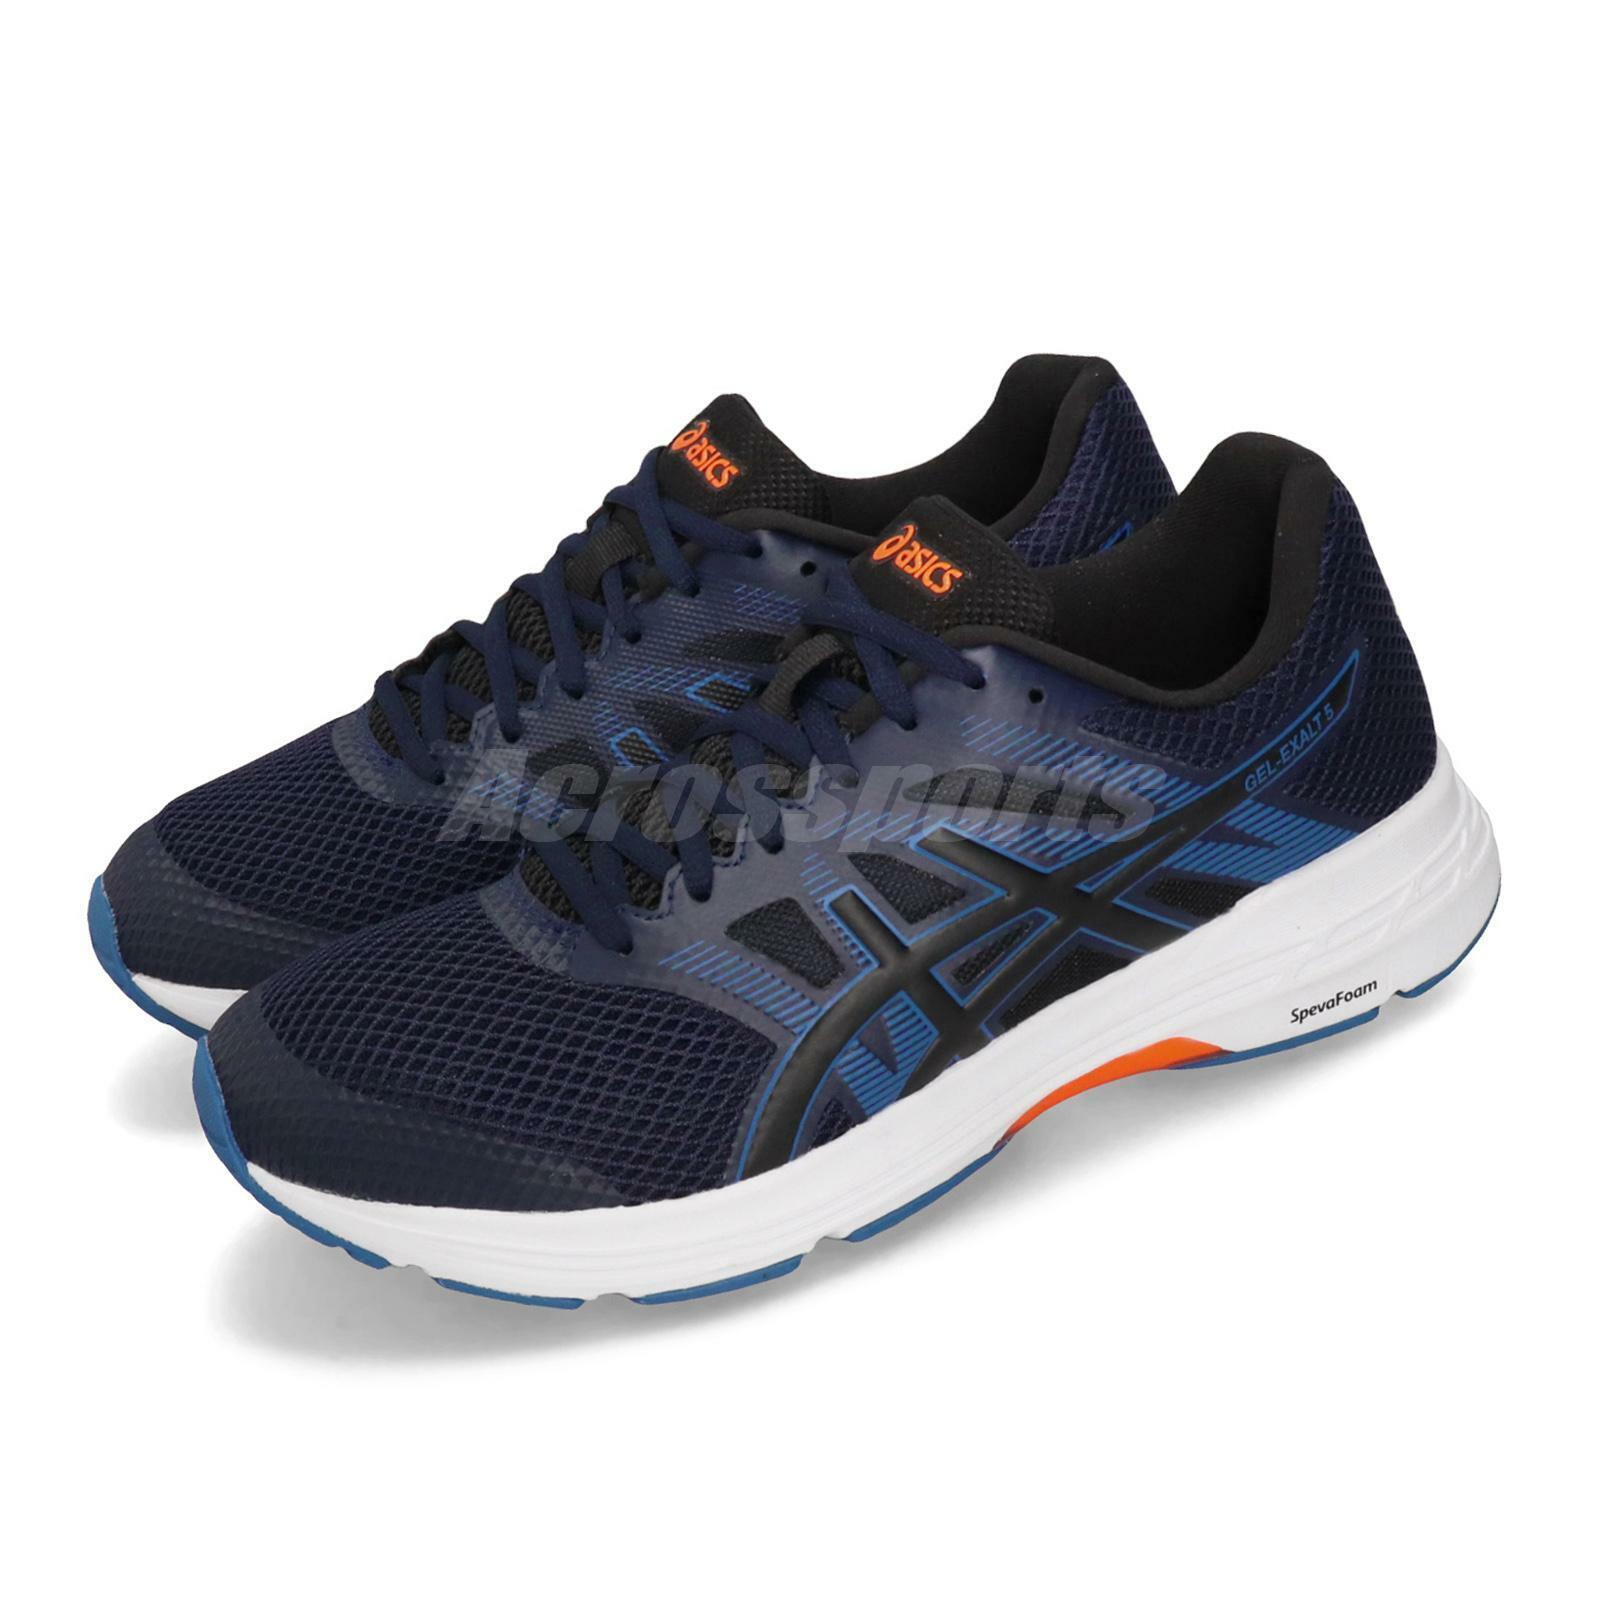 Asics GelExalt 5 Peacoat blu bianca Men Running scarpe scarpe da ginnastica 1011A162401